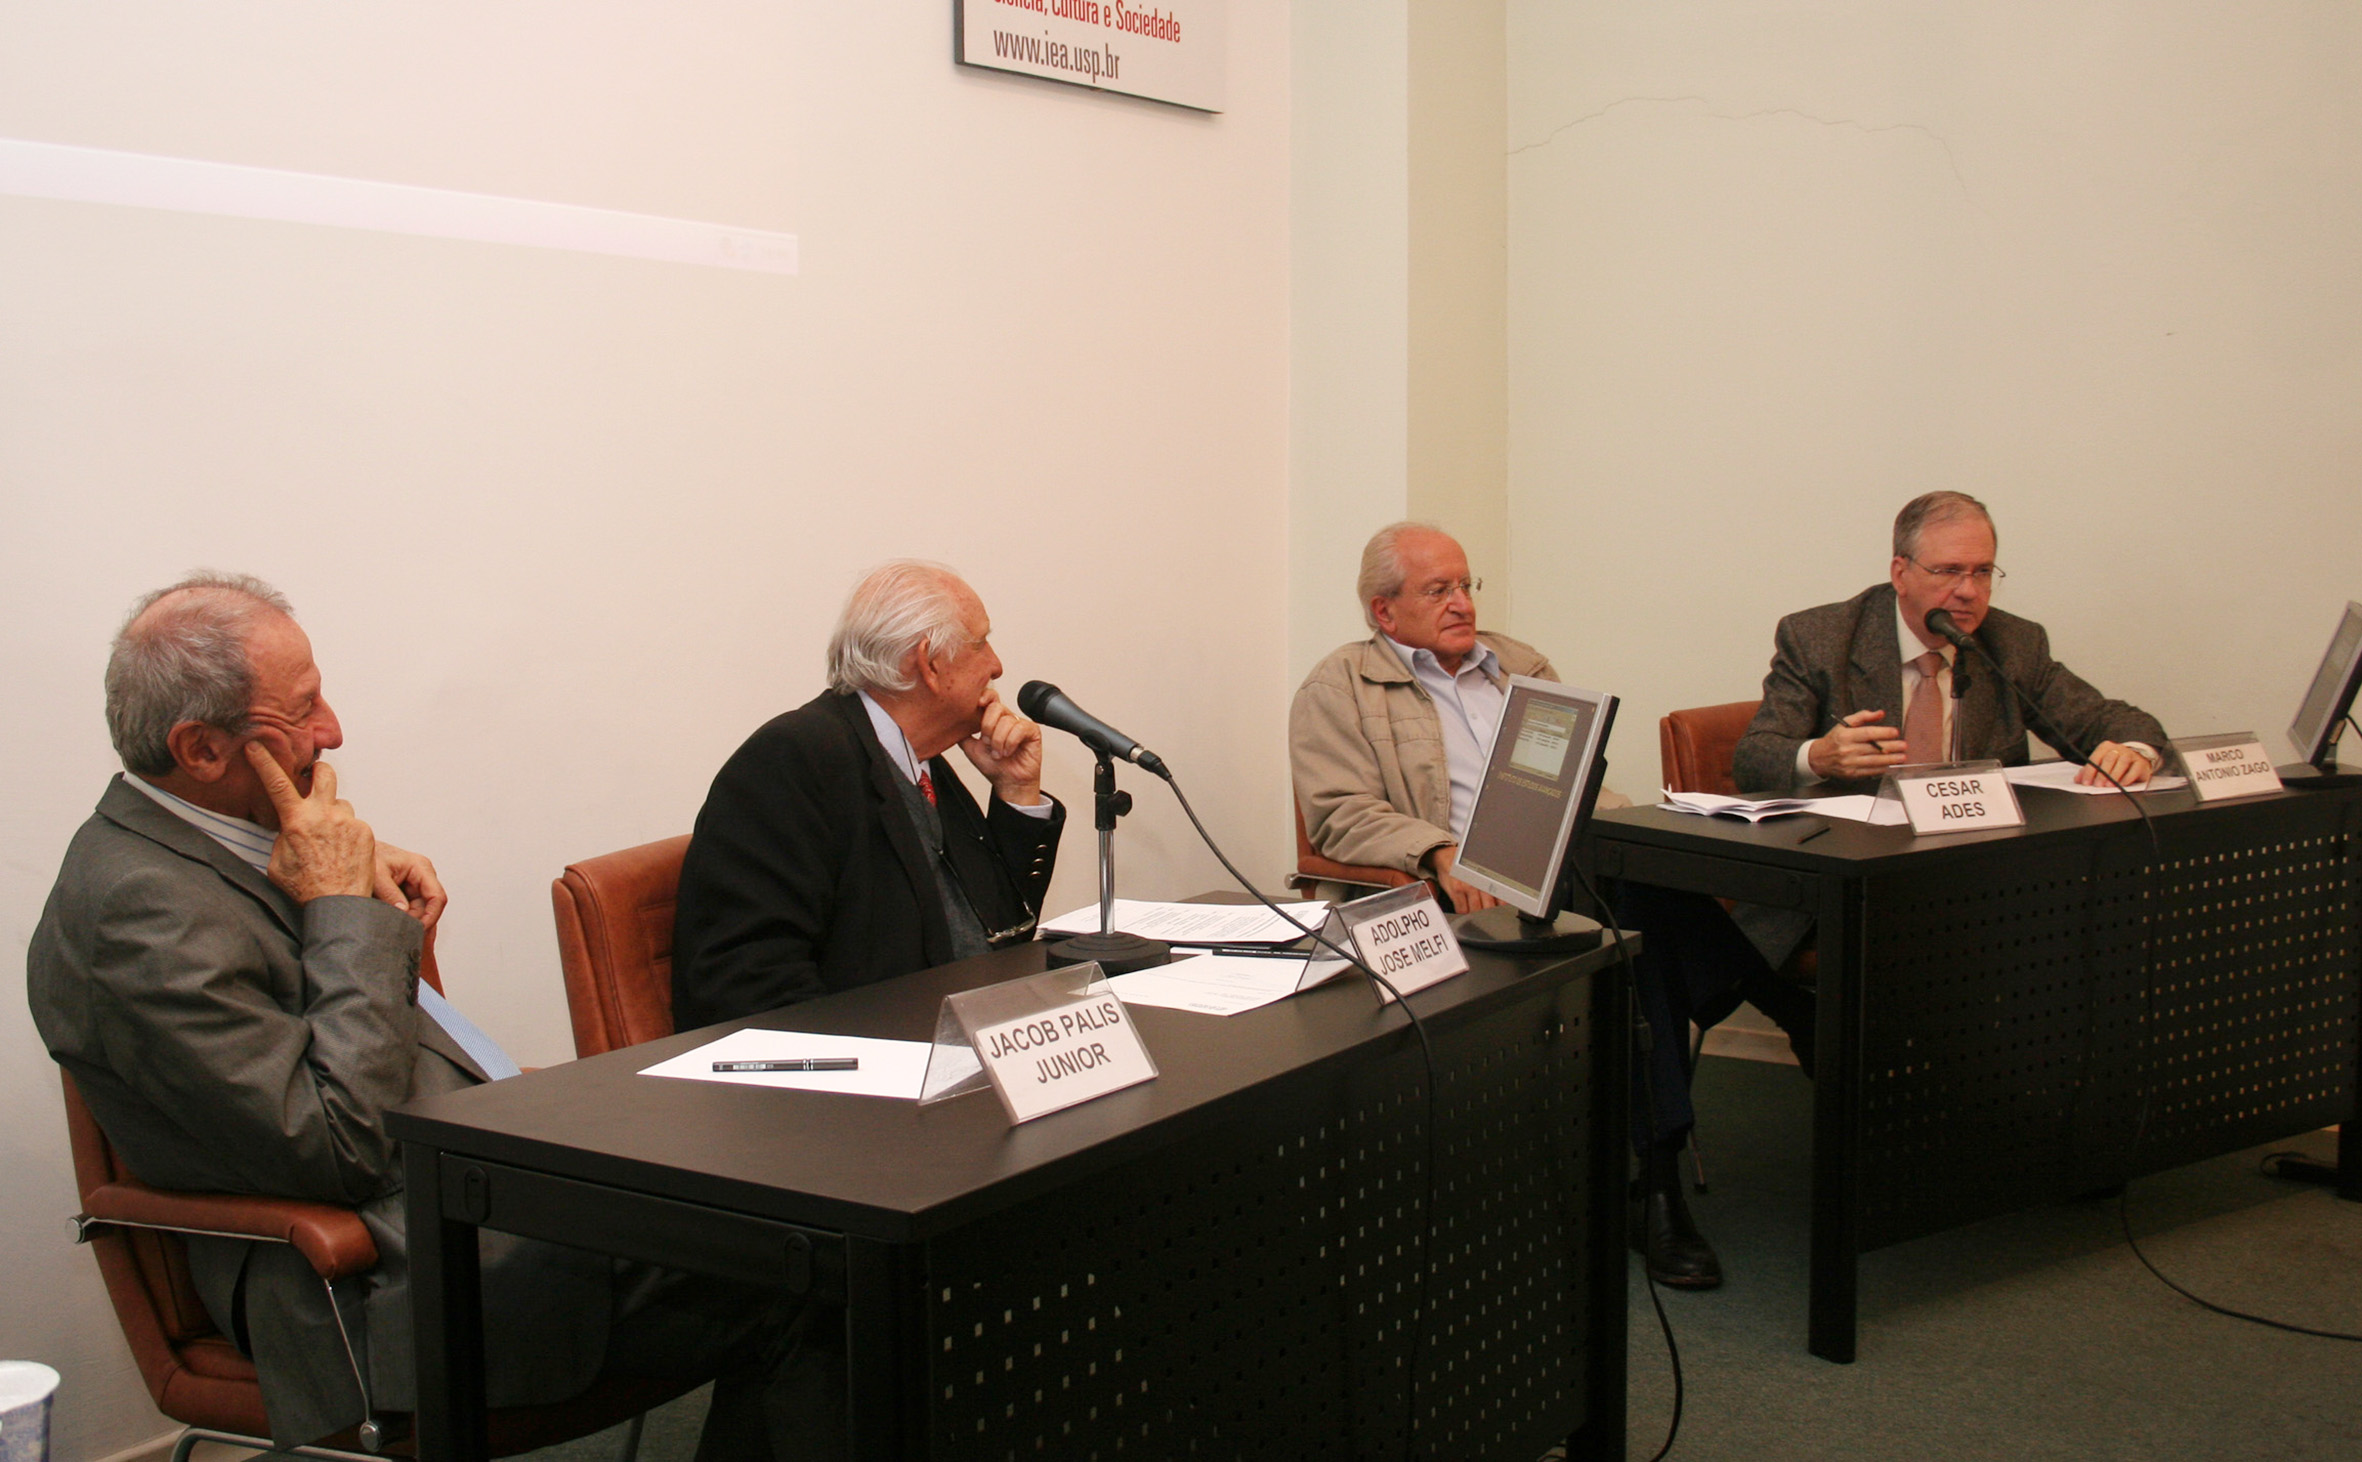 Jacob Palis Jr, Adolpho José Melfi, César Ades e Marco Antonio Zago